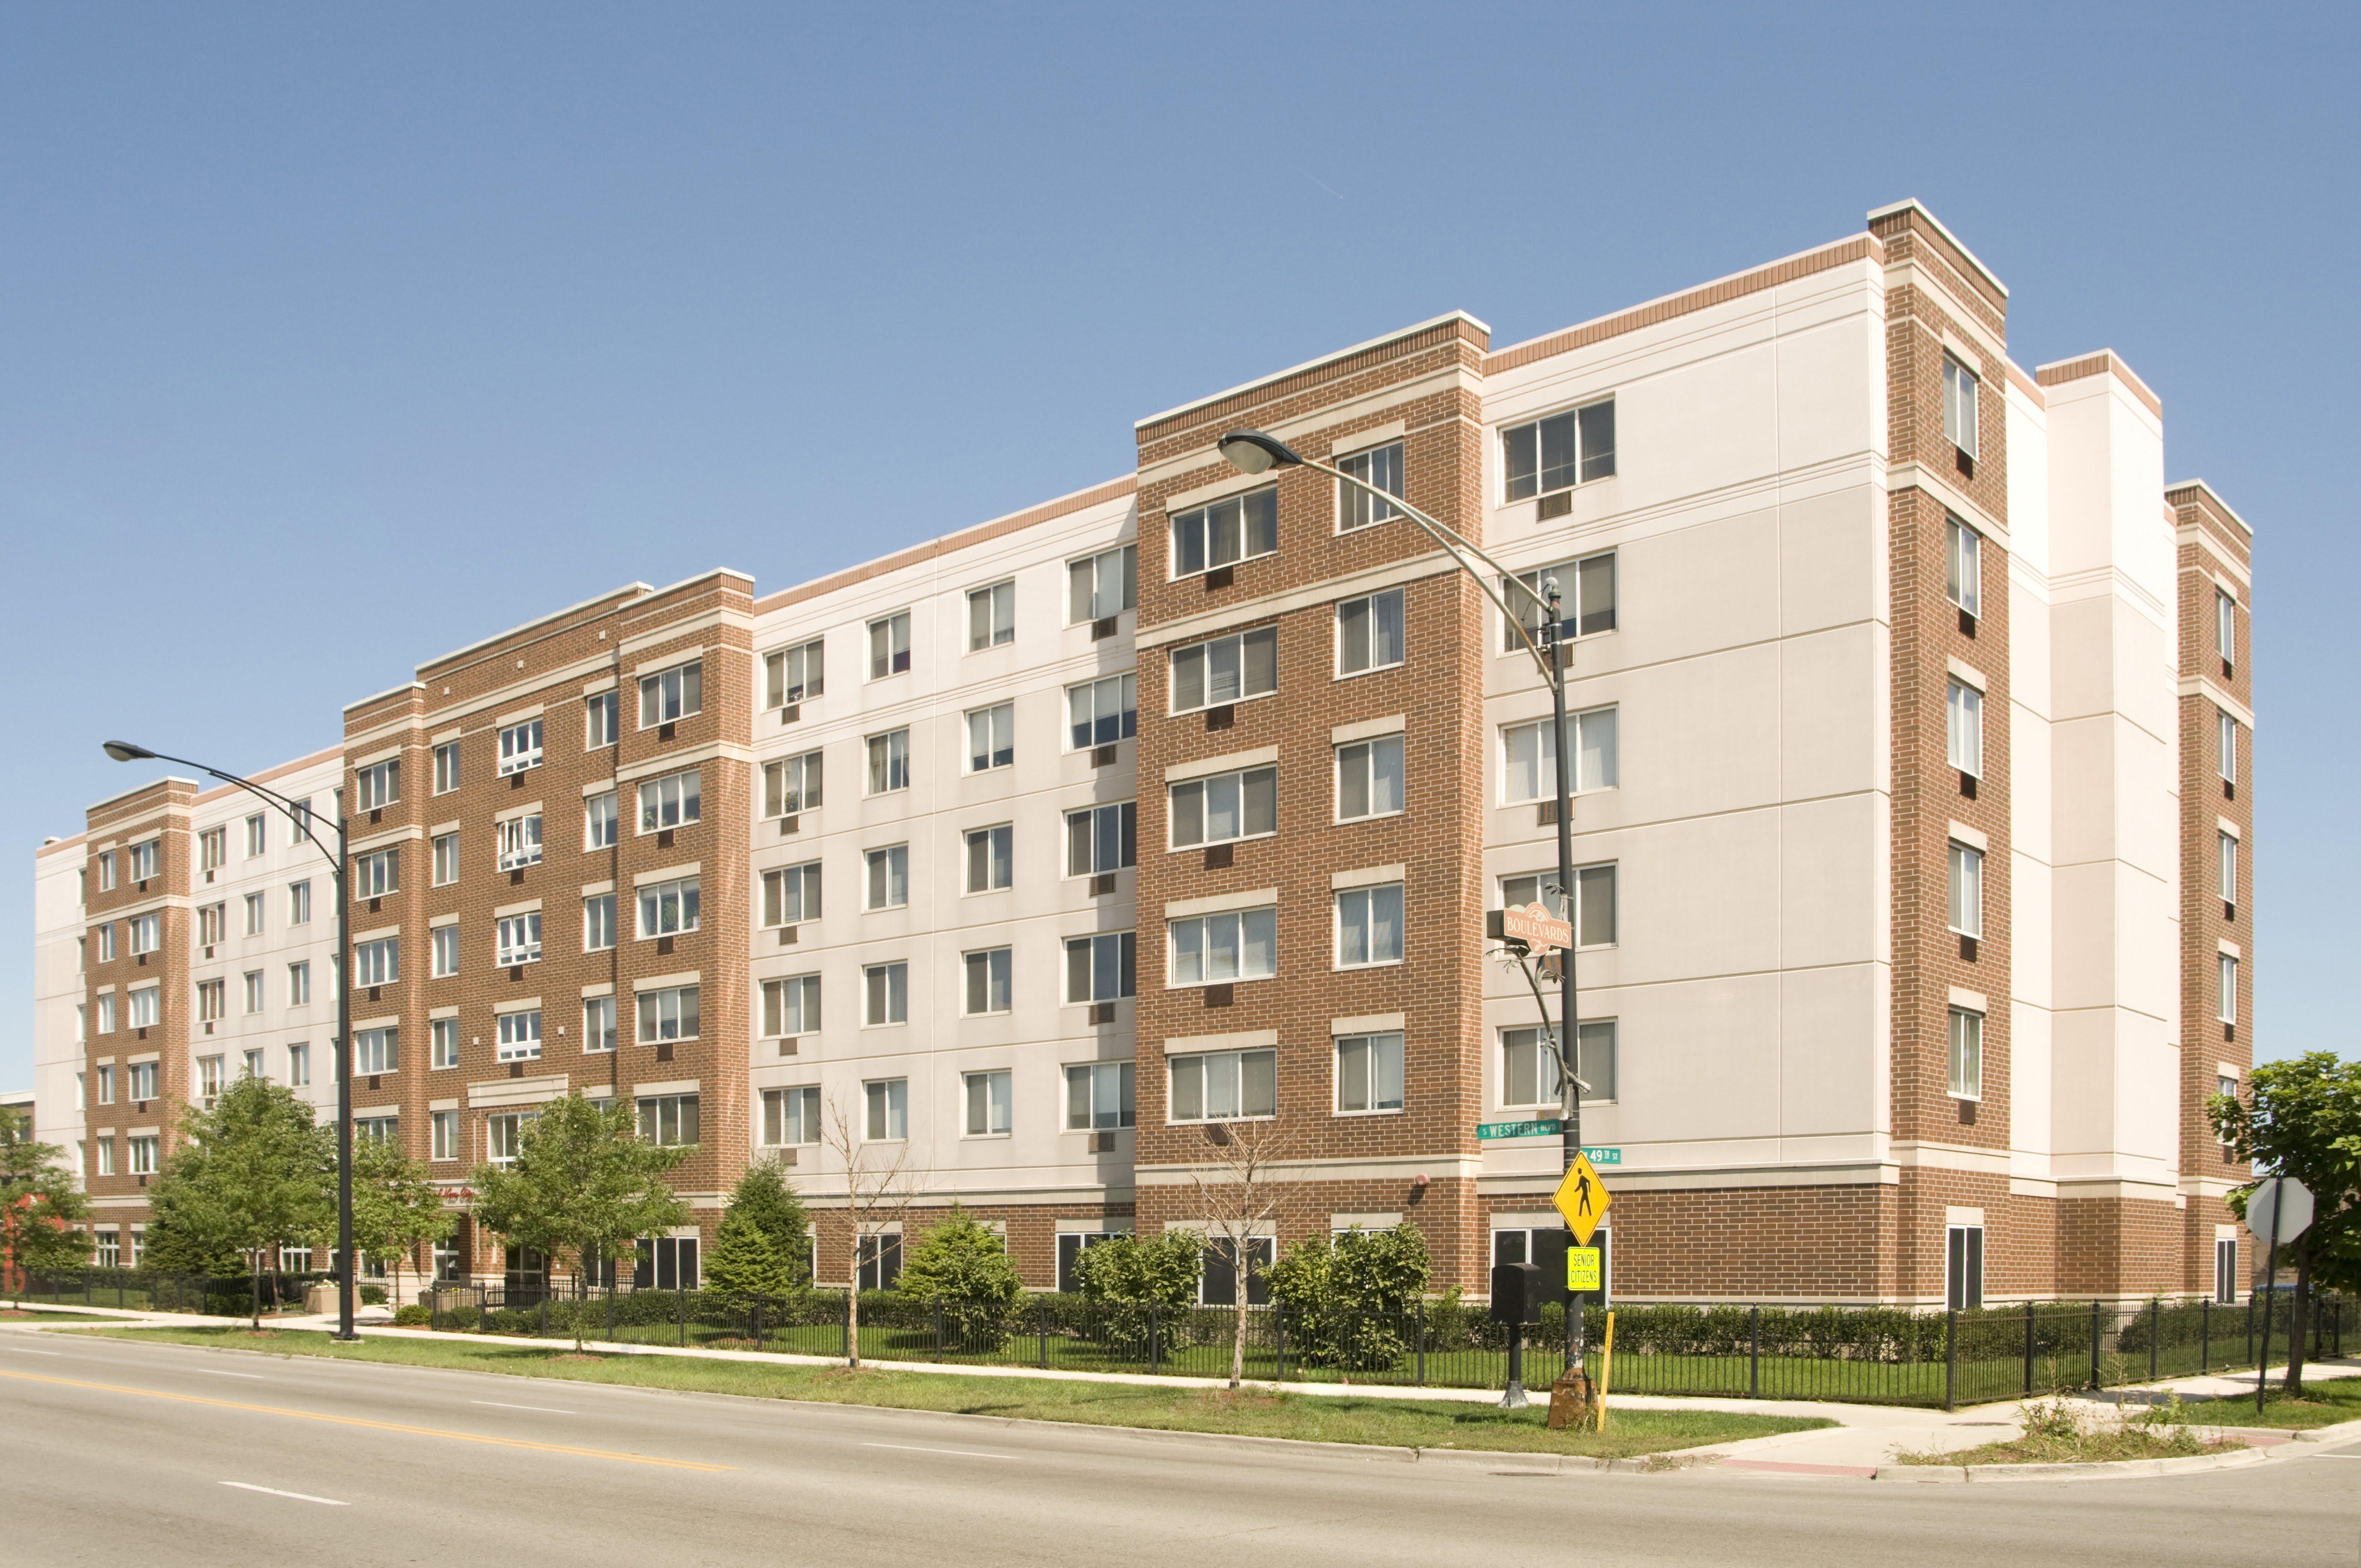 Photo 1 of Senior Suites of New City